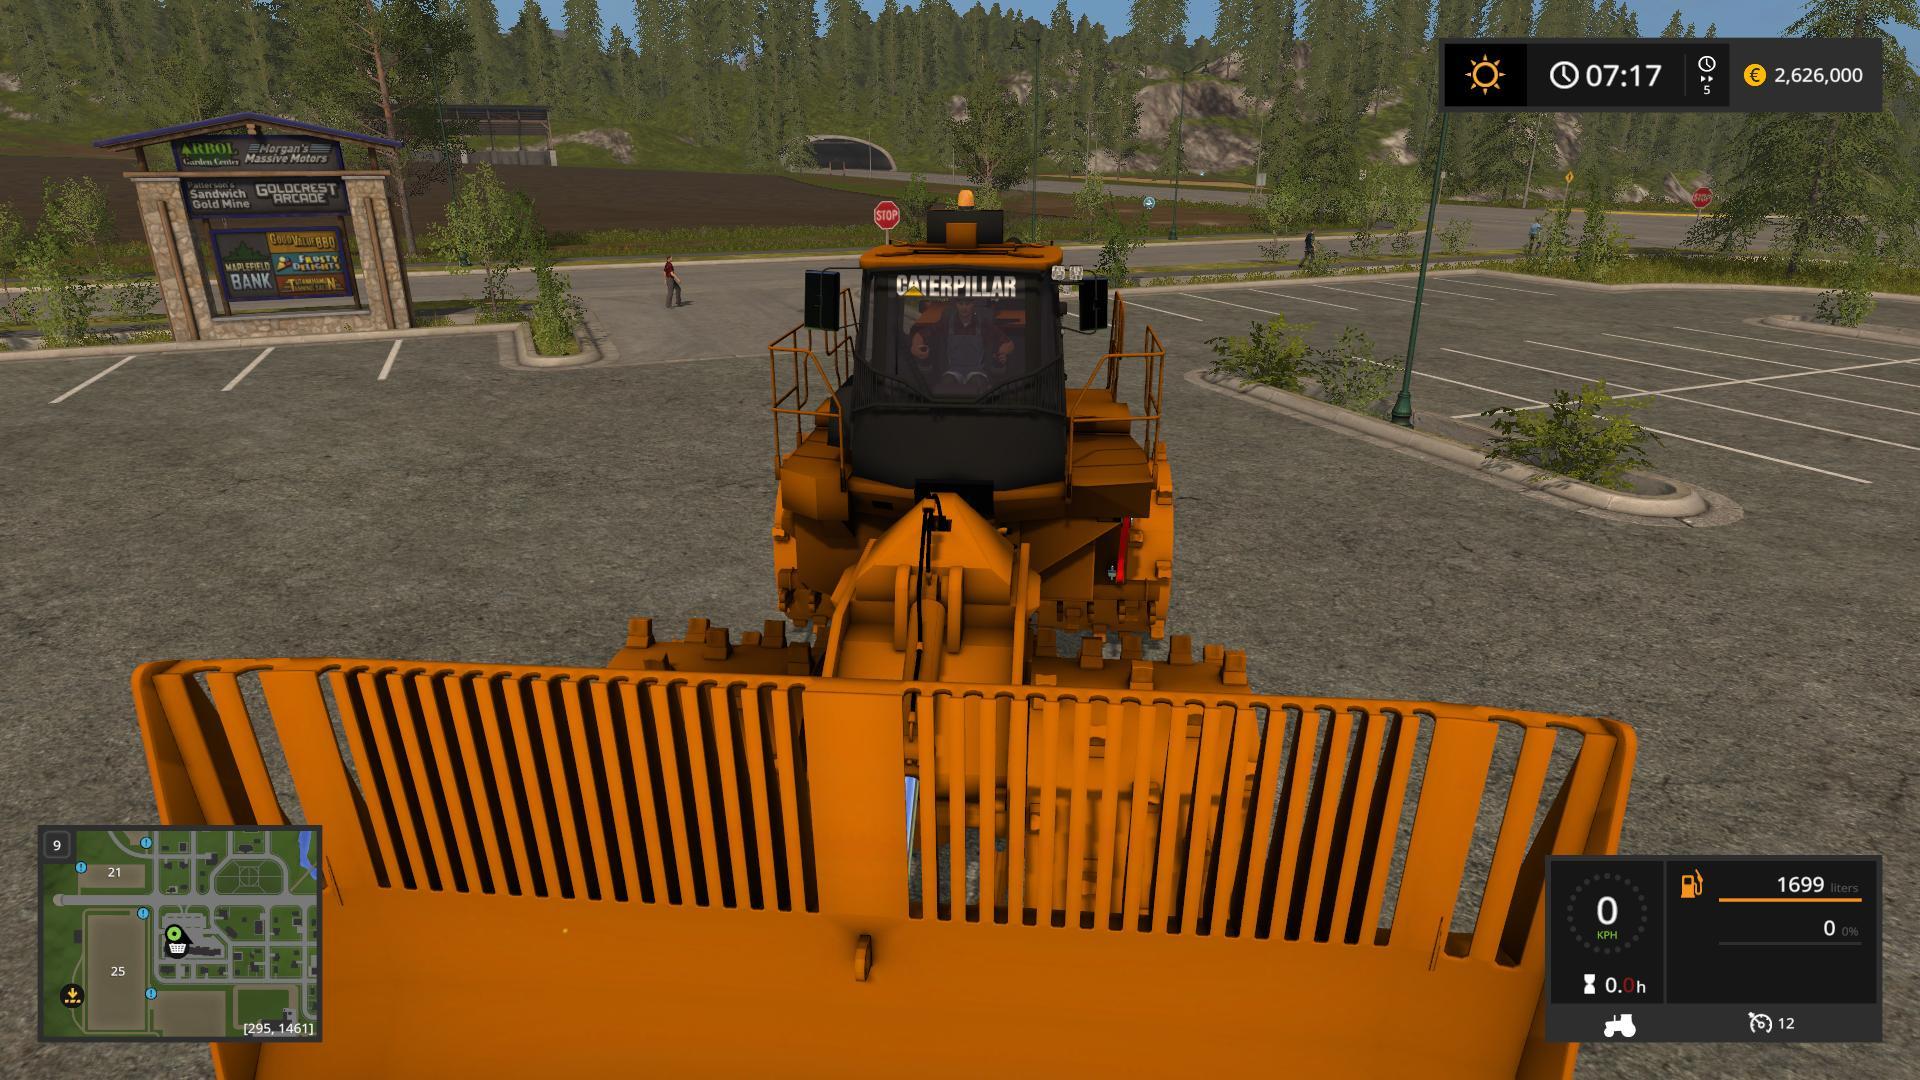 CATERPILLAR 836K V1 0 0 FS17 - Mod download